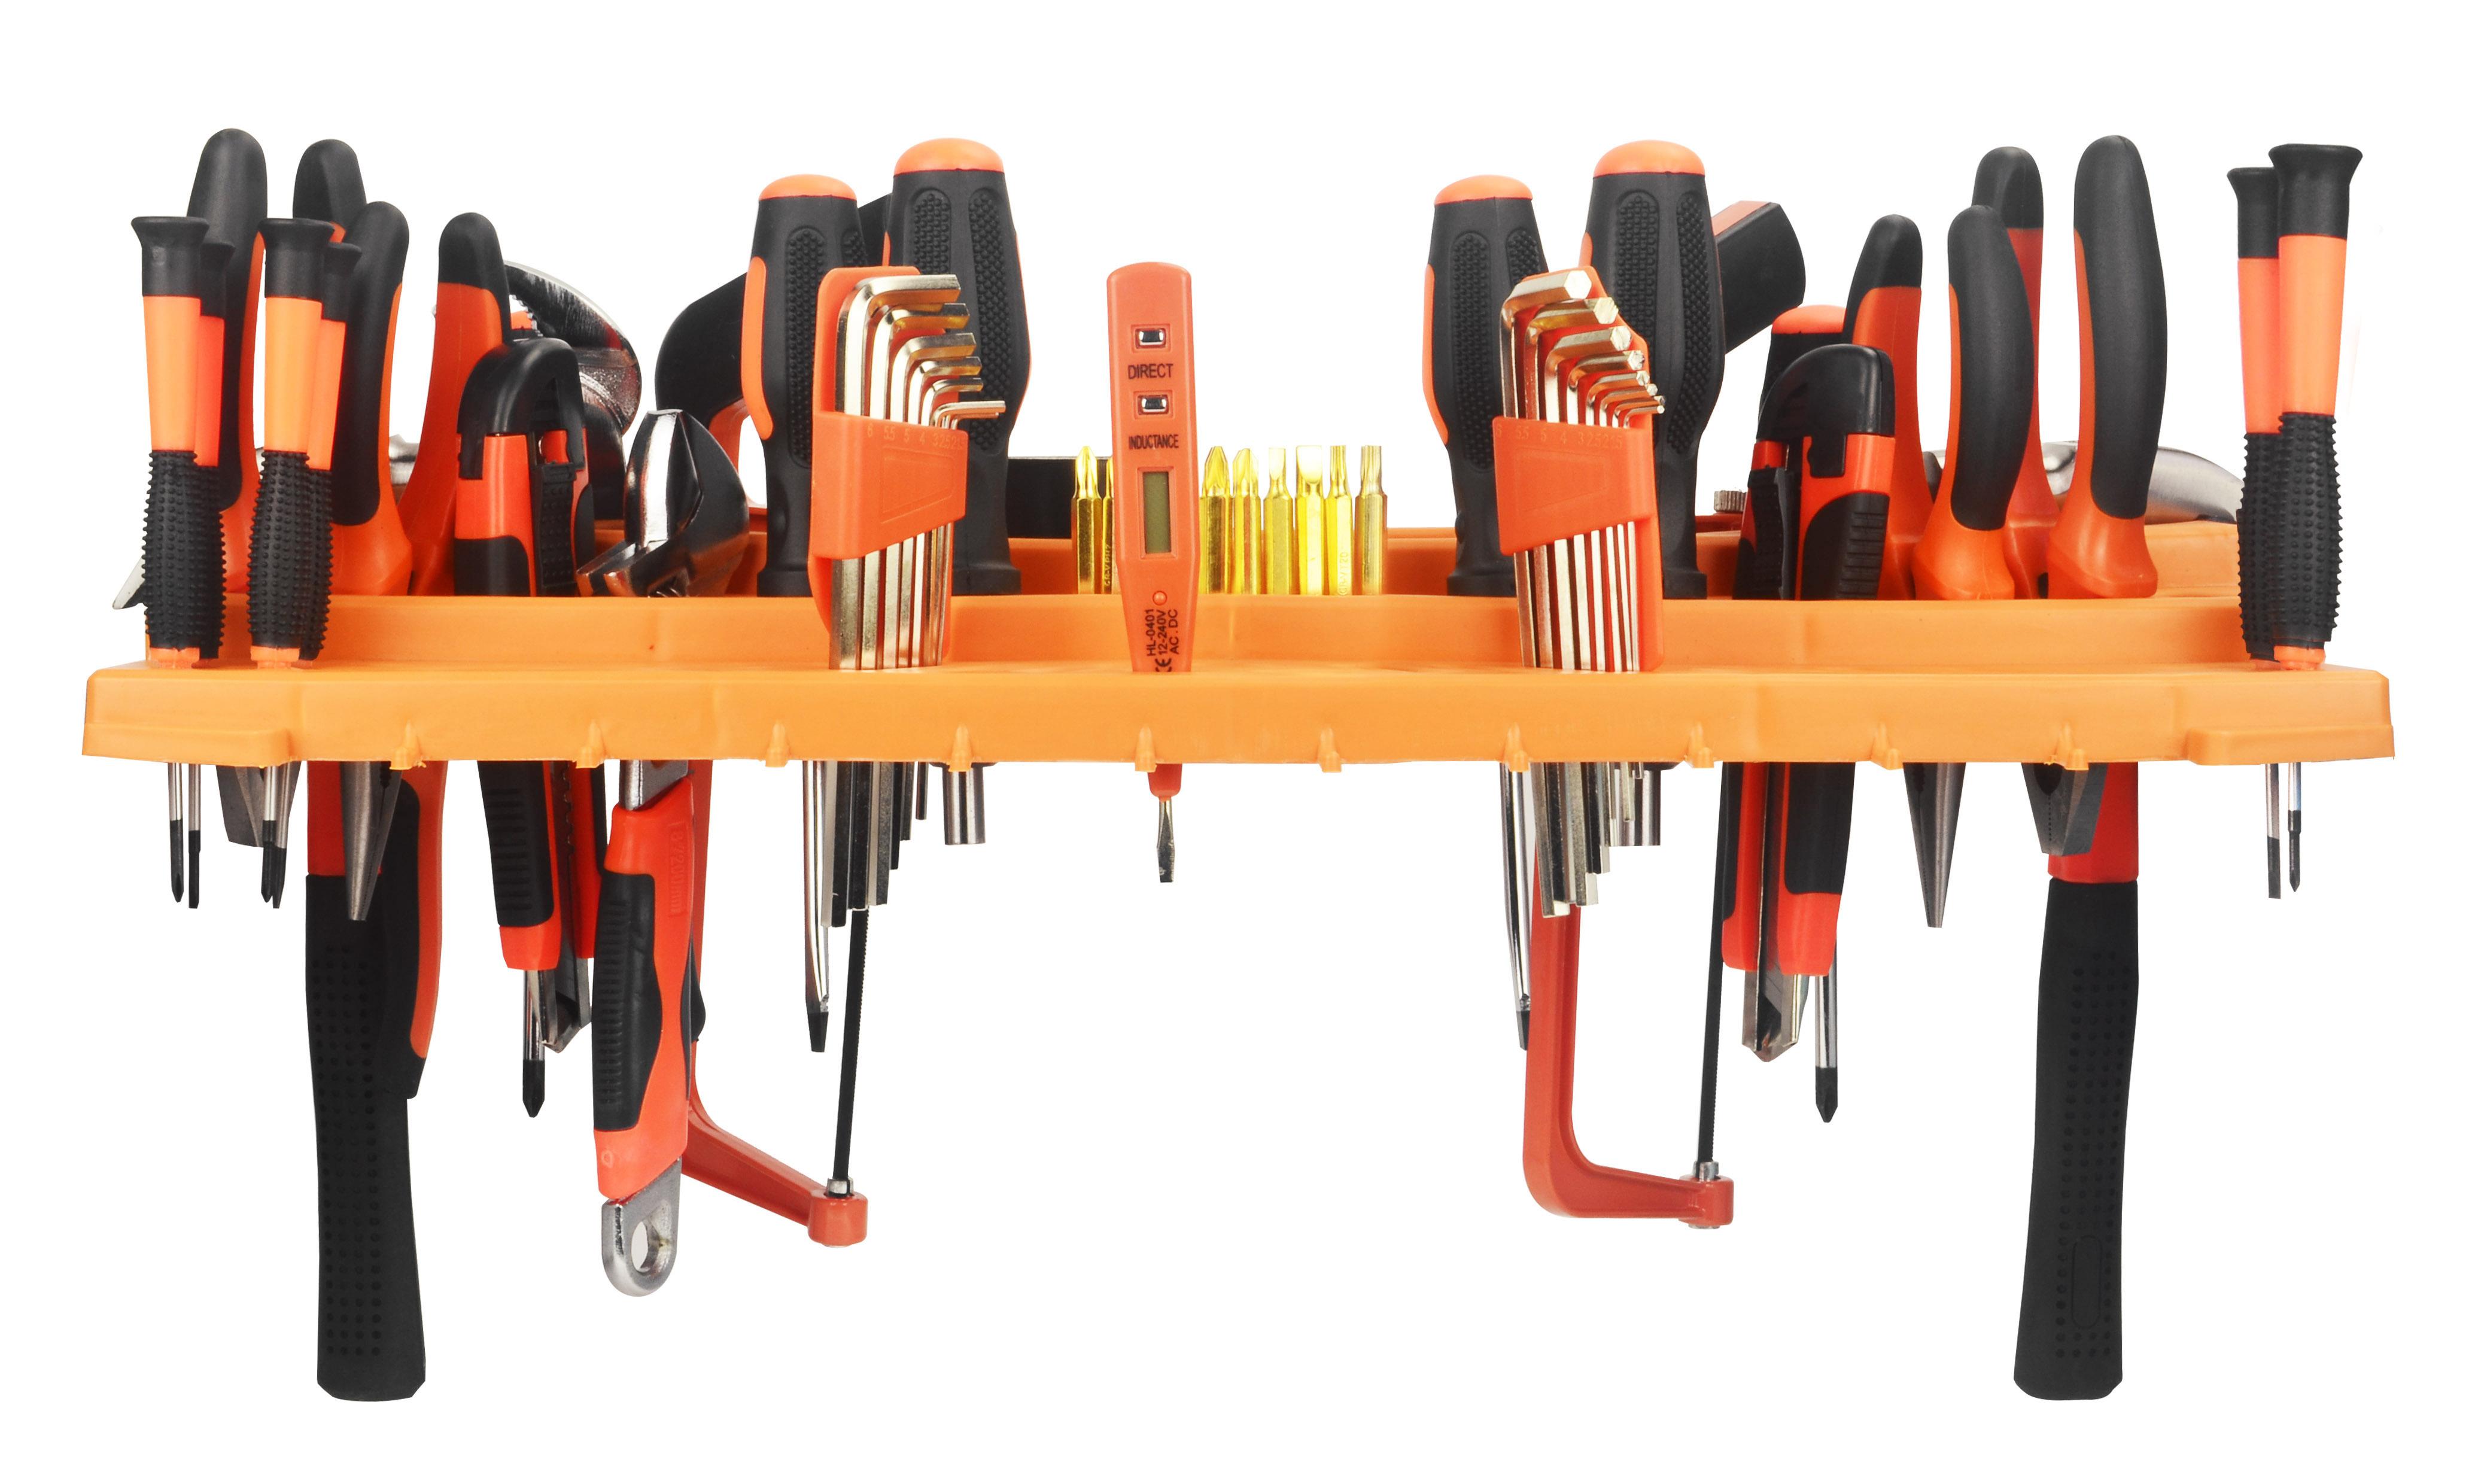 DIY-It Tool Wall Mount Shelf (only)